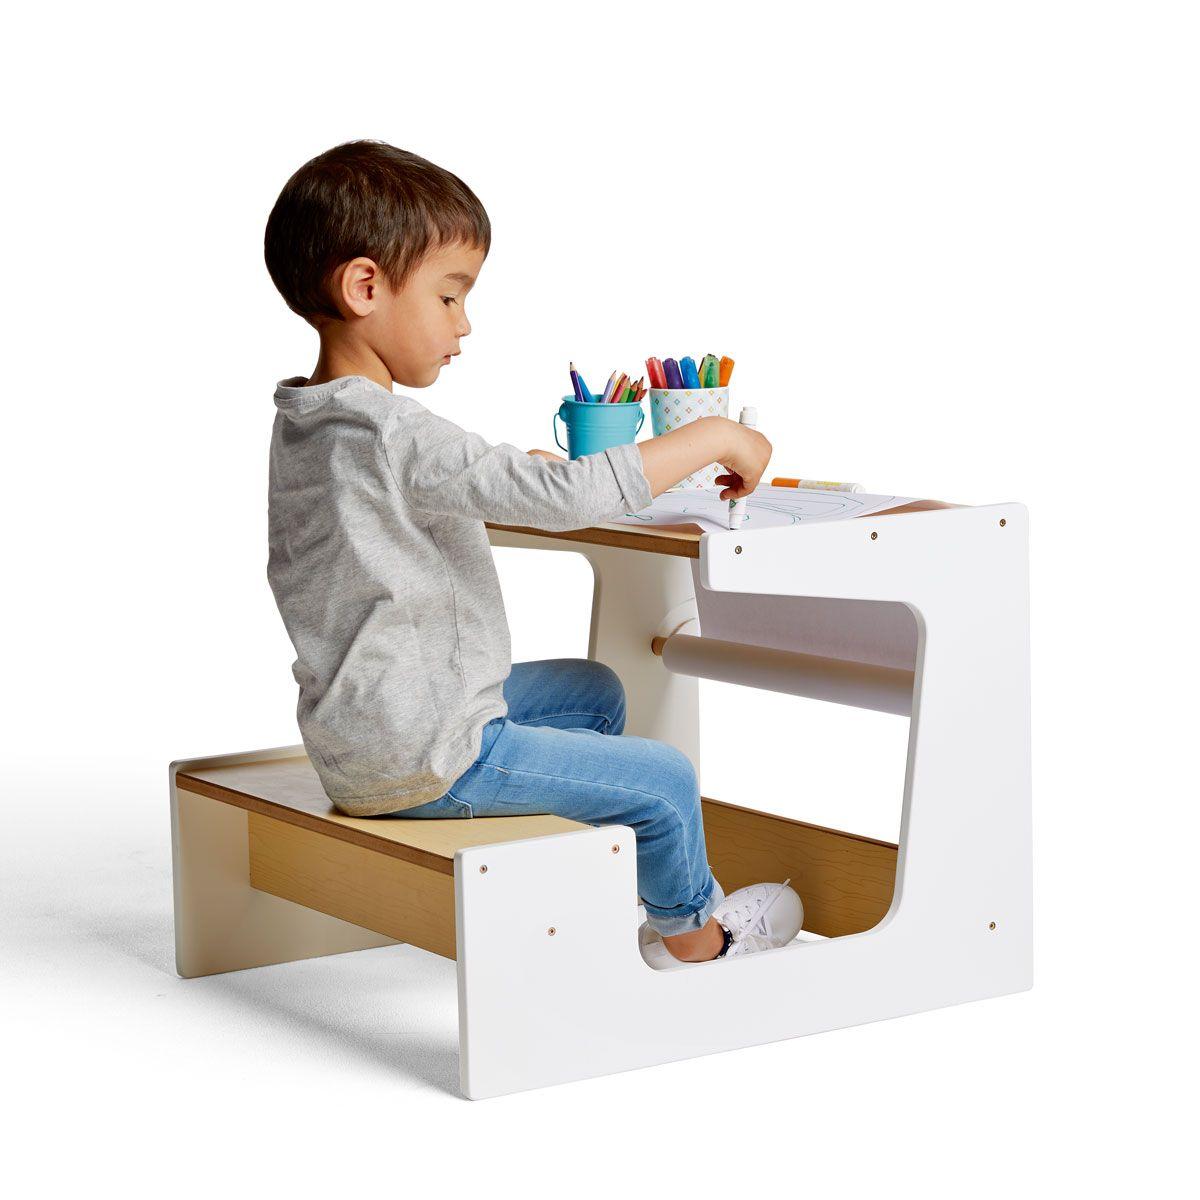 Bureau Enfant 2 Ans petit bureau naturel blanc izibul création oxybul | petit